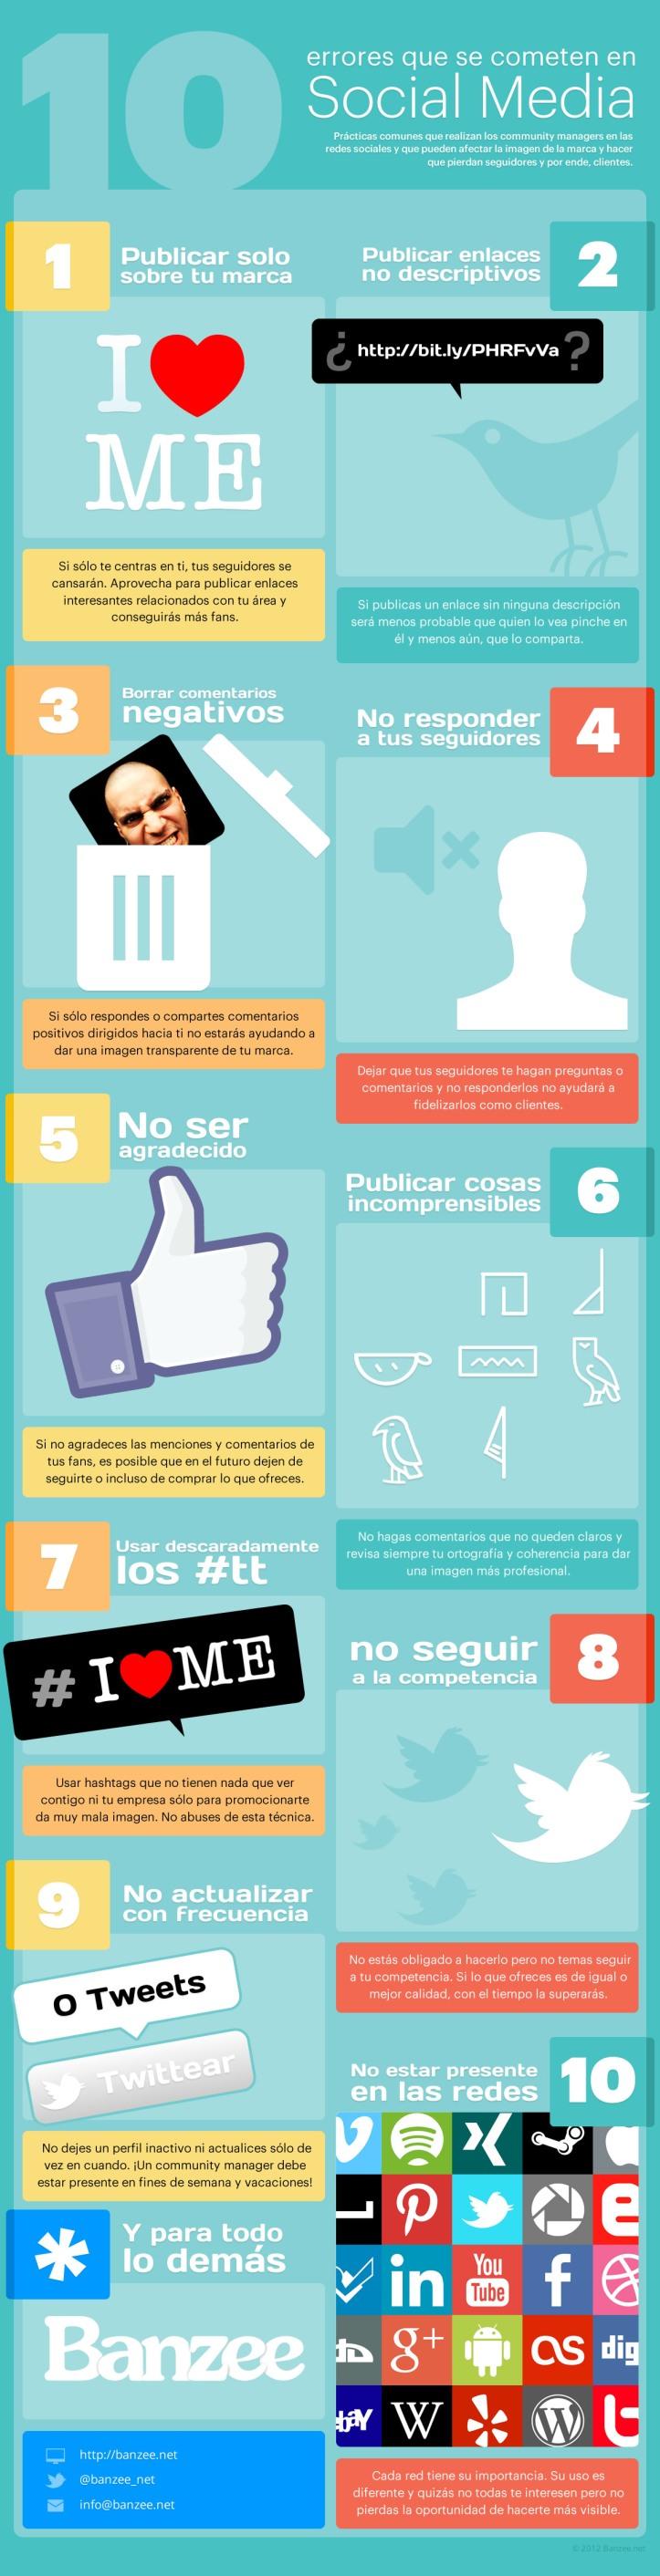 10 errores que se cometen en Social Media - Infografía